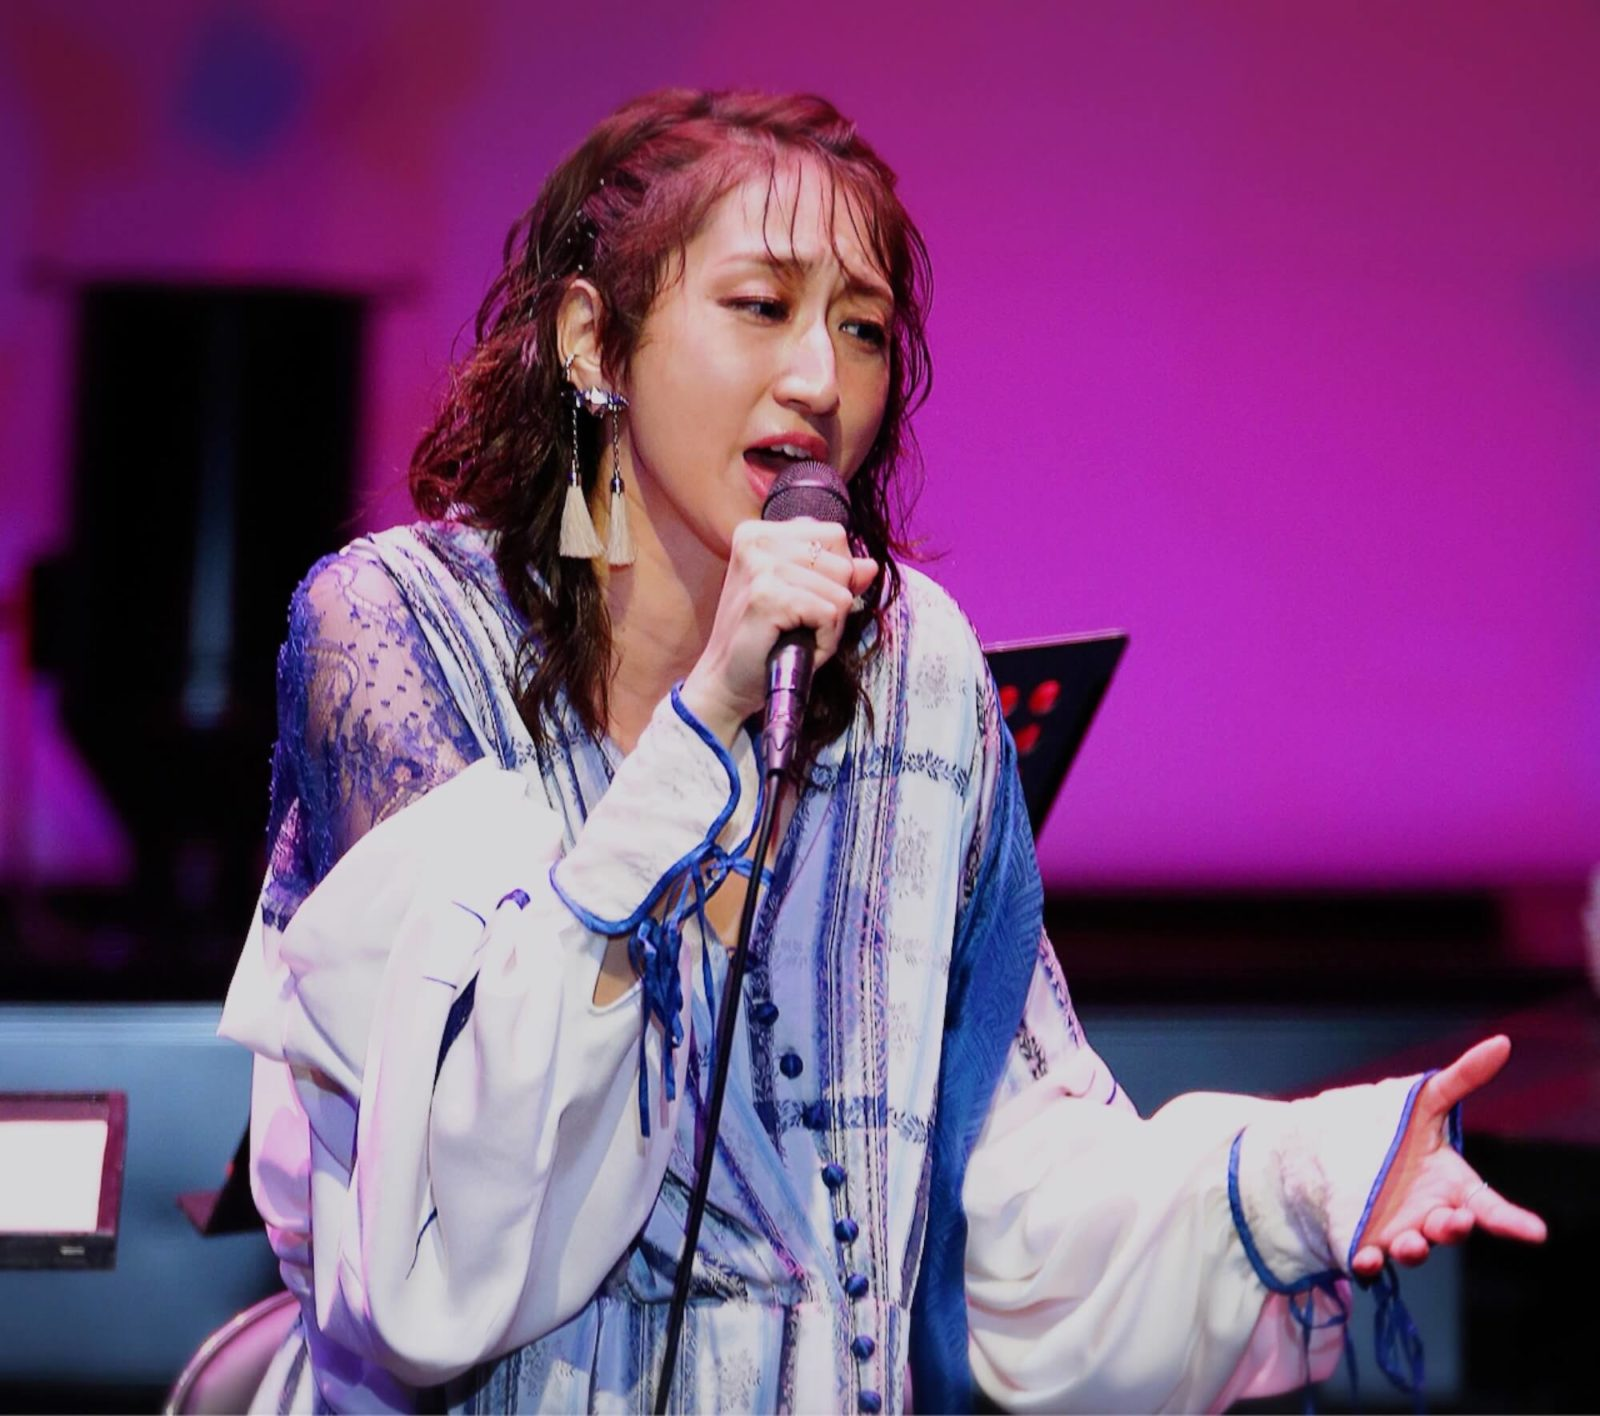 Ms.OOJA、全国アコースティック・ワンマンツアー「Ms.OOJA Acoustic LIVE TOUR 2019 SHINE」満員御礼の金沢公演にてフィナーレサムネイル画像